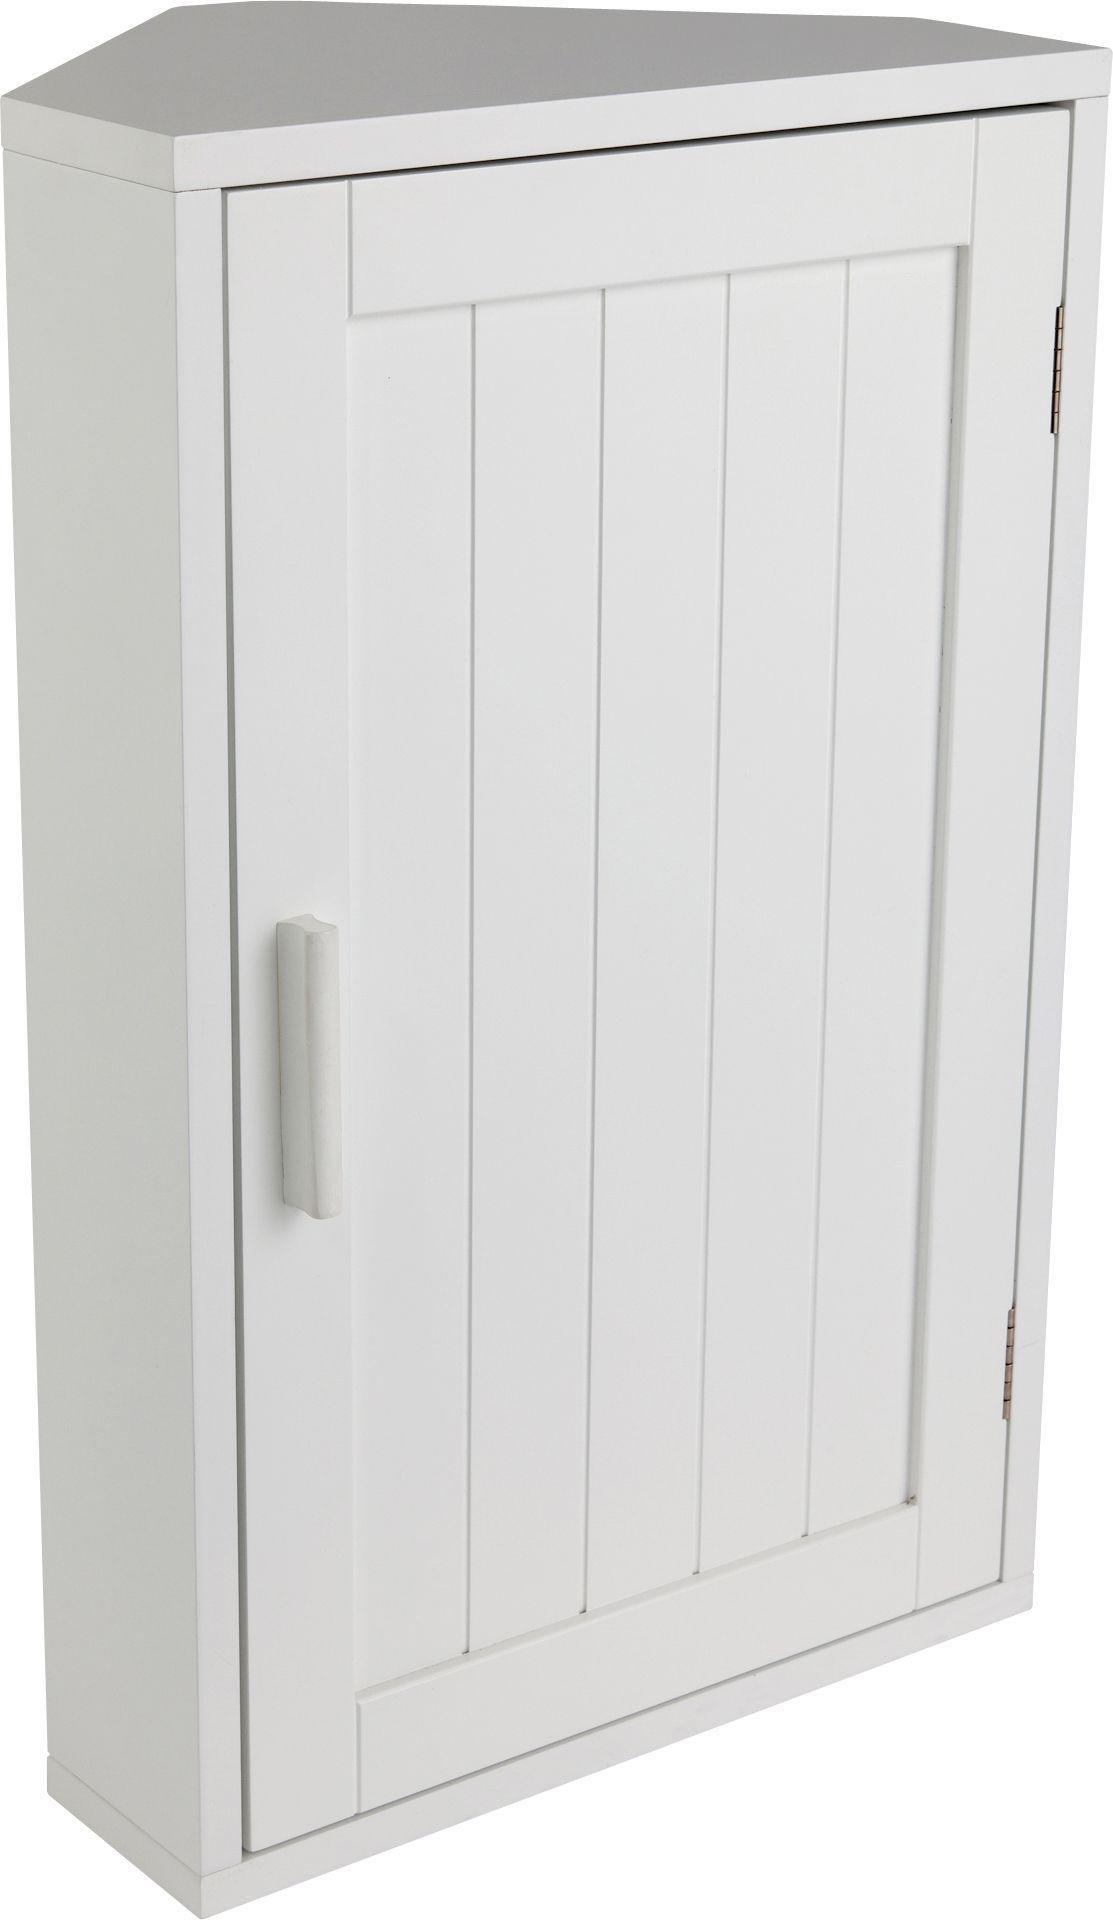 Bathroom corner cabinet white